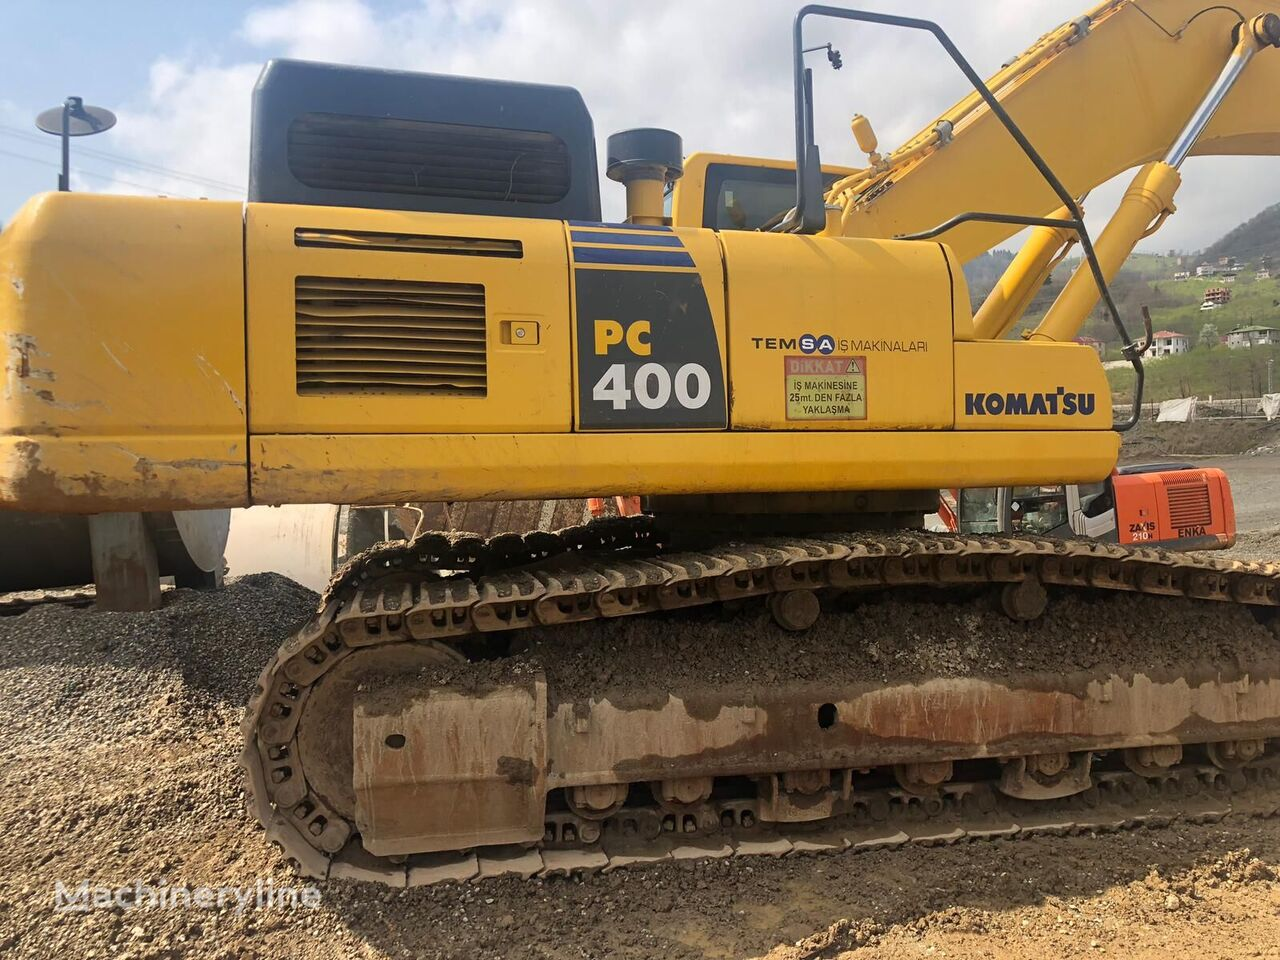 KOMATSU PC400-8 tracked excavator